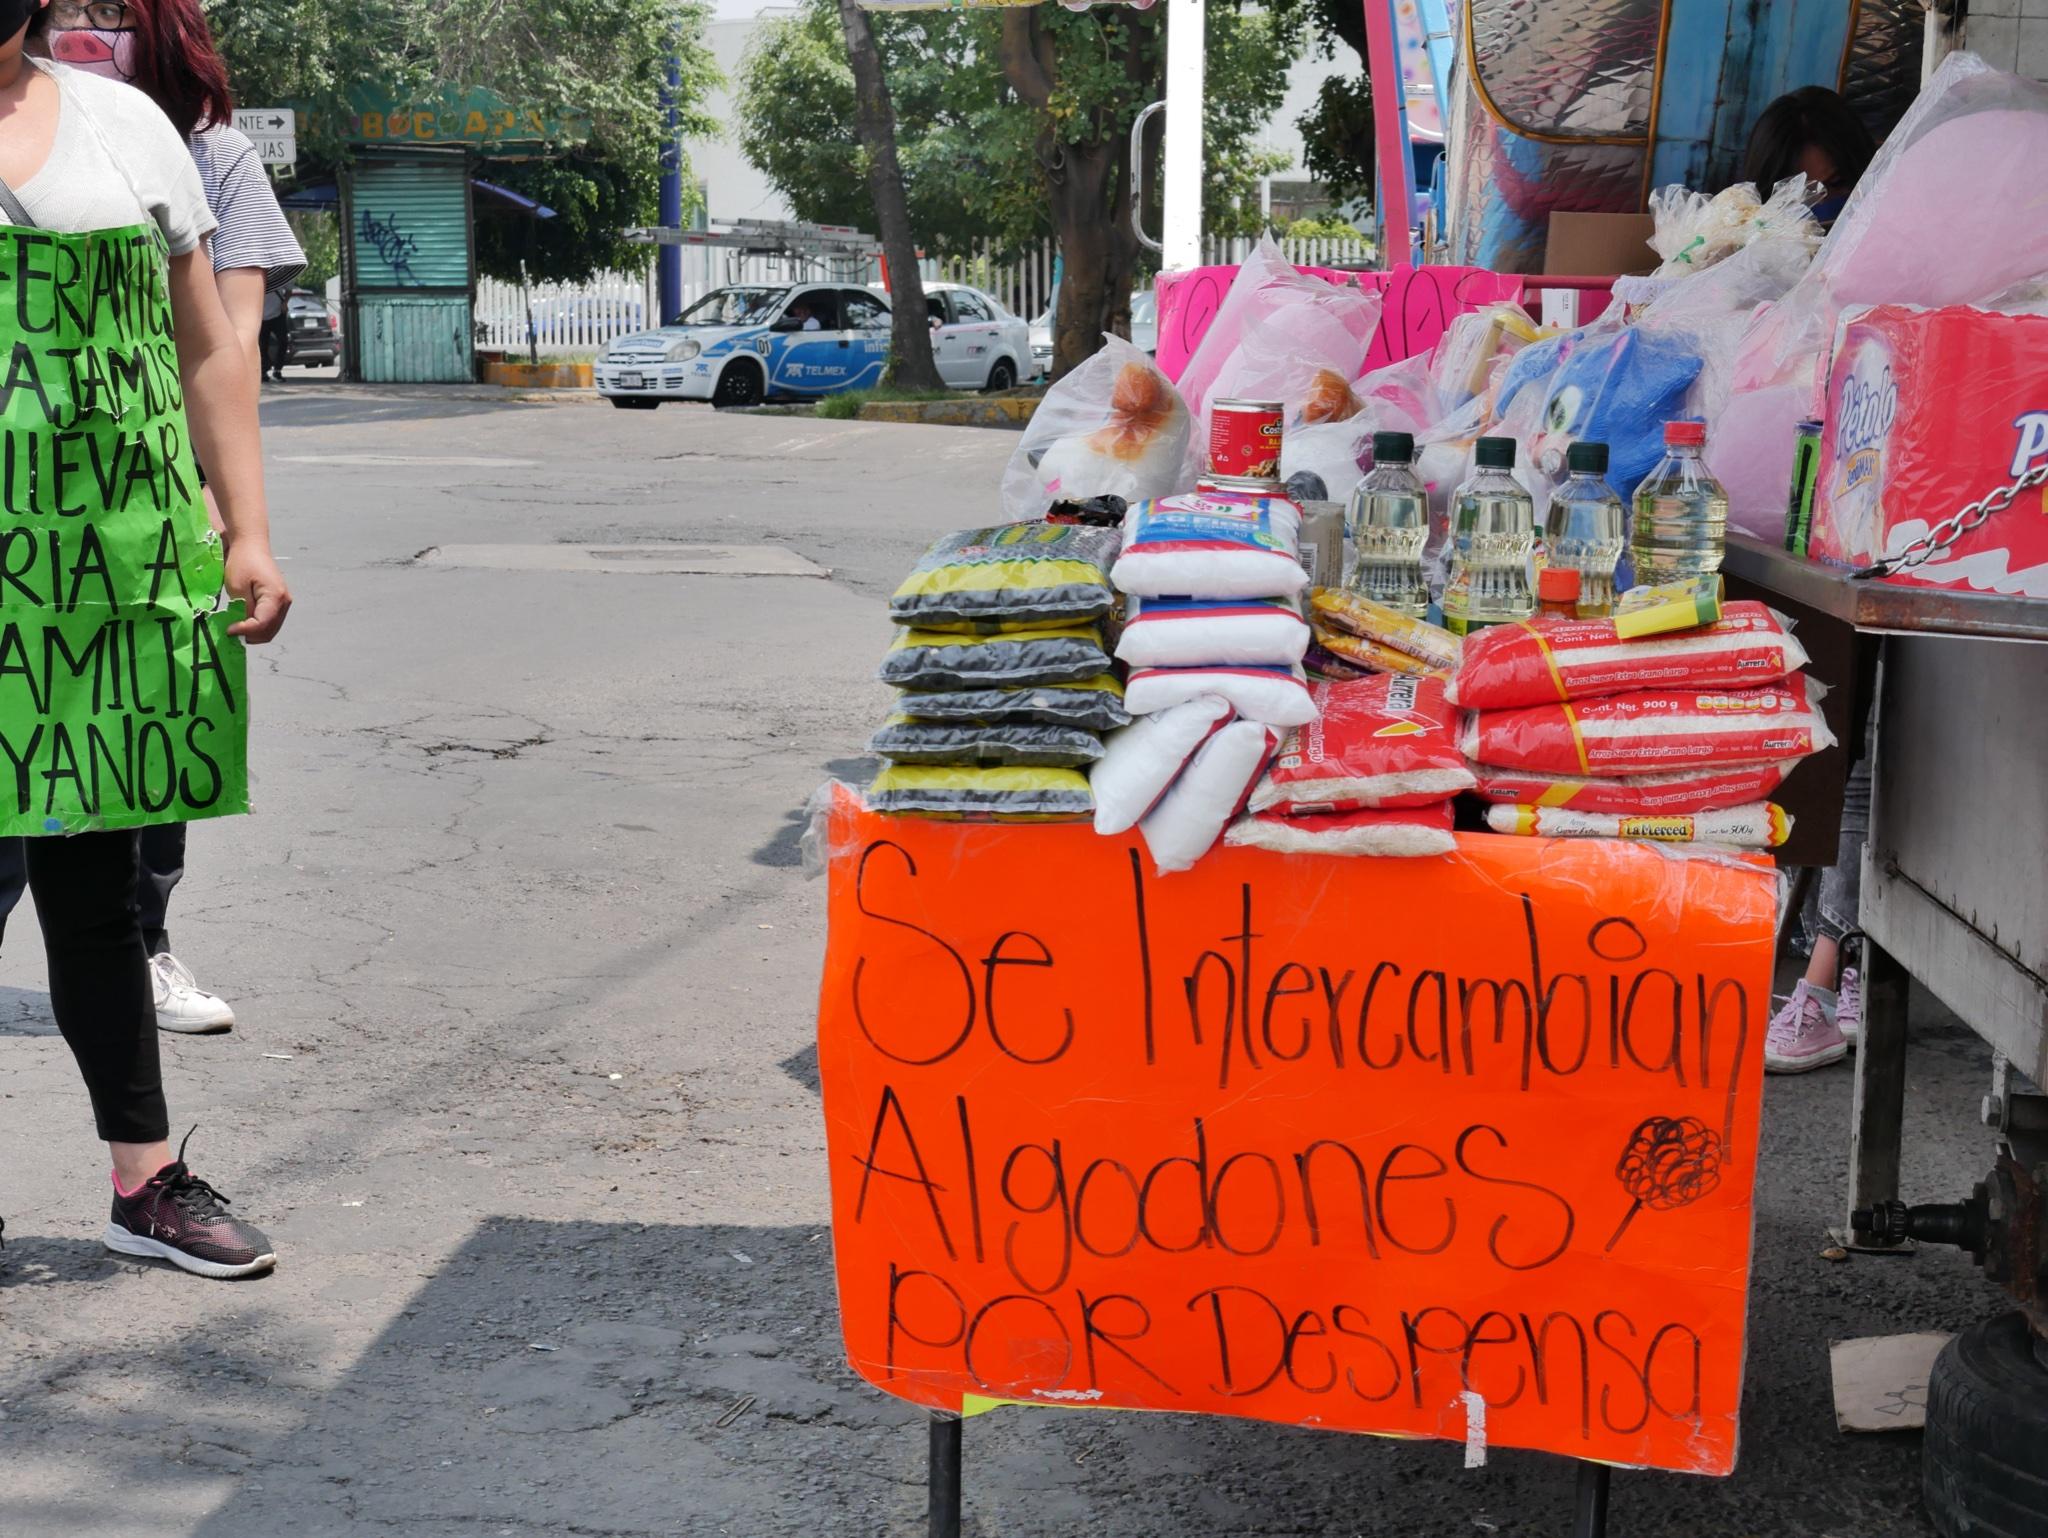 COMERCIANTES INTERCAMBIAN PRODUCTOS DE FERIA POR DESPENSA EN CDMX